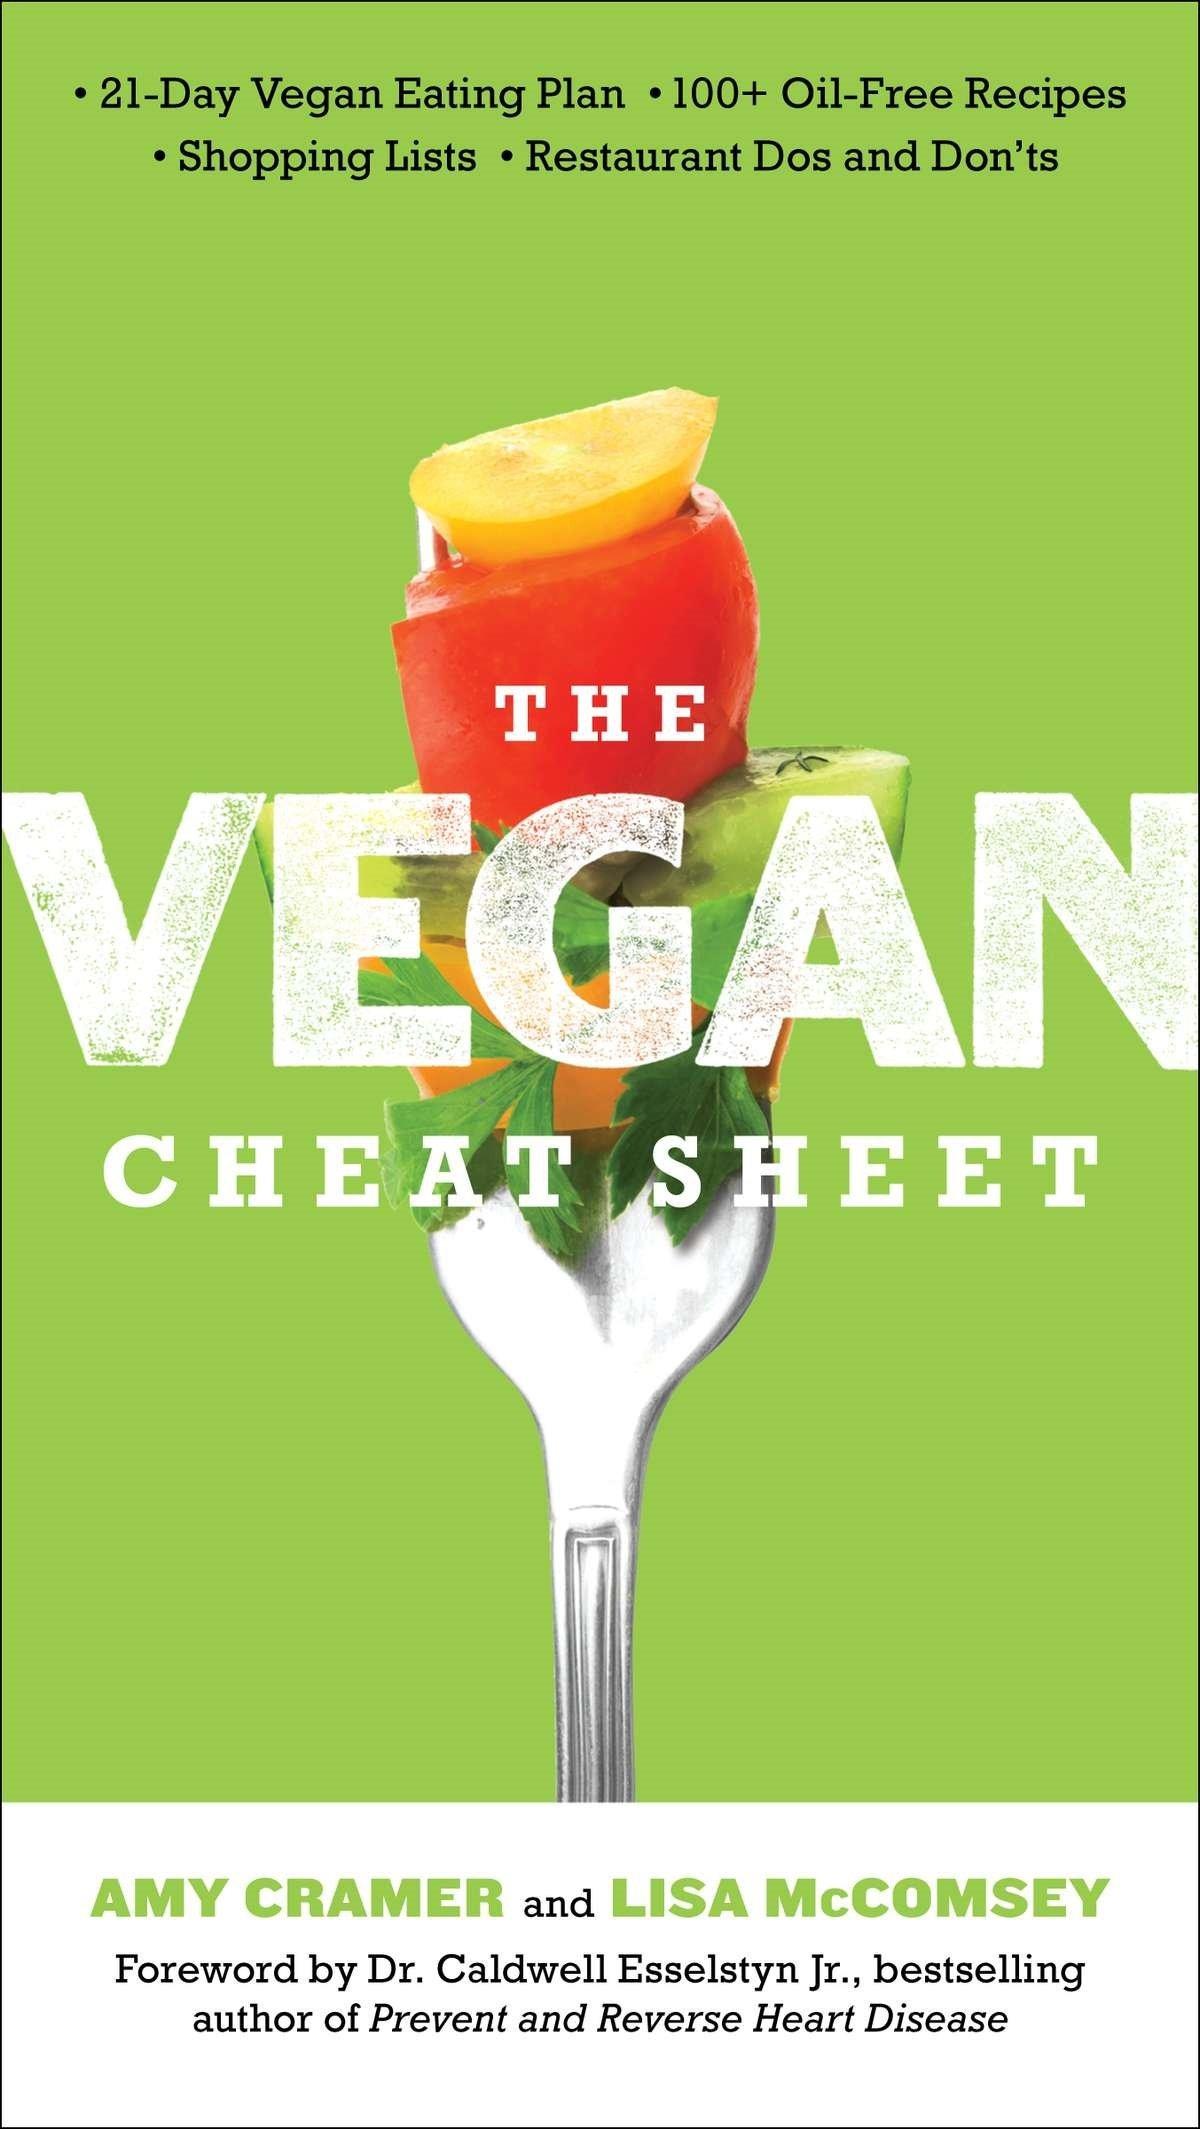 Vegan Cheat Sheet Take Everywhere Plant based product image